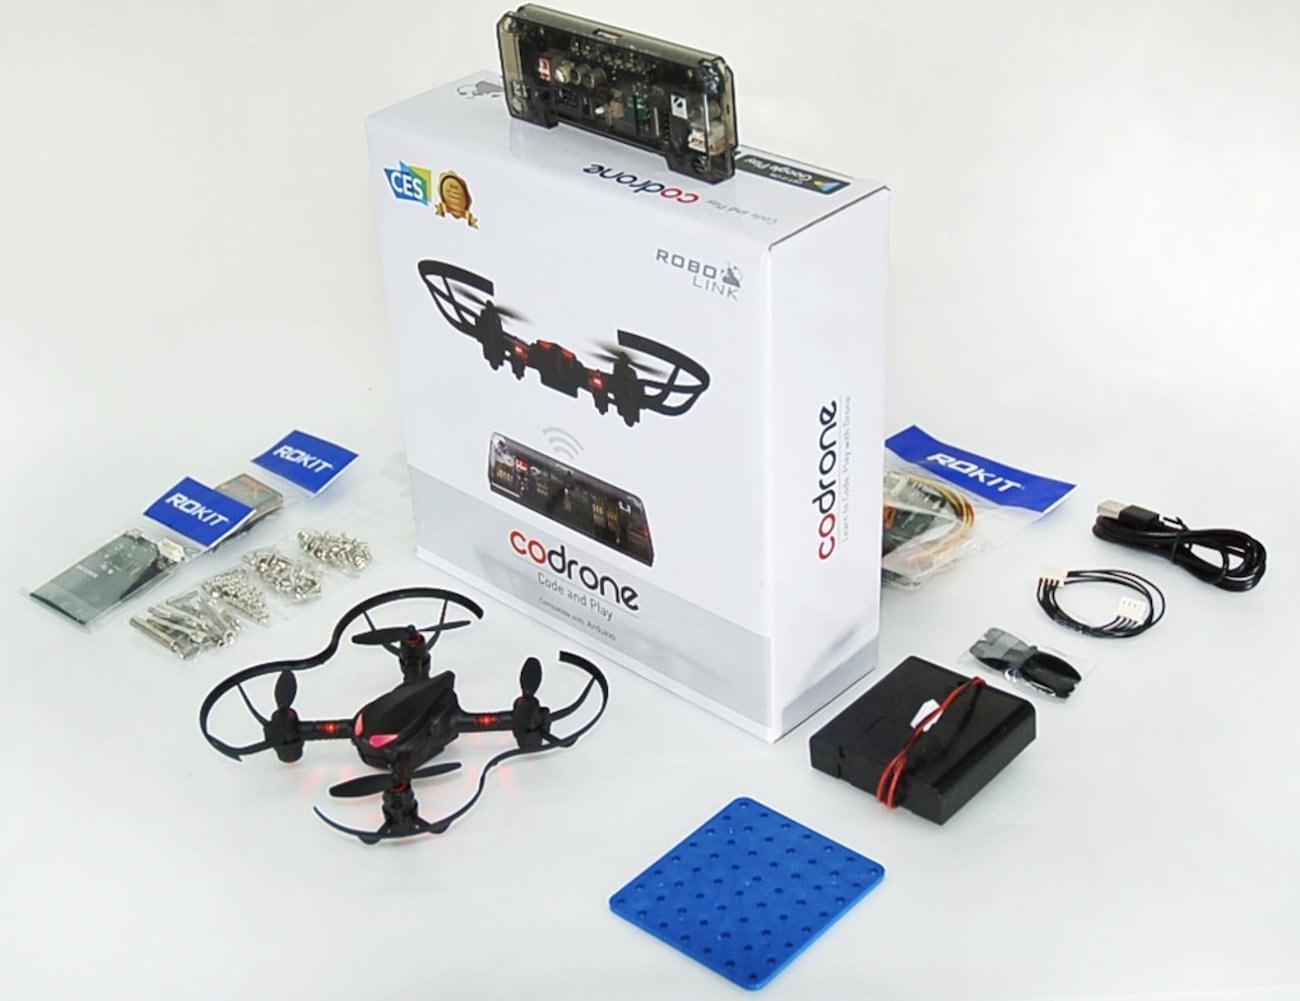 CoDrone Pro Programmable Educational Drone